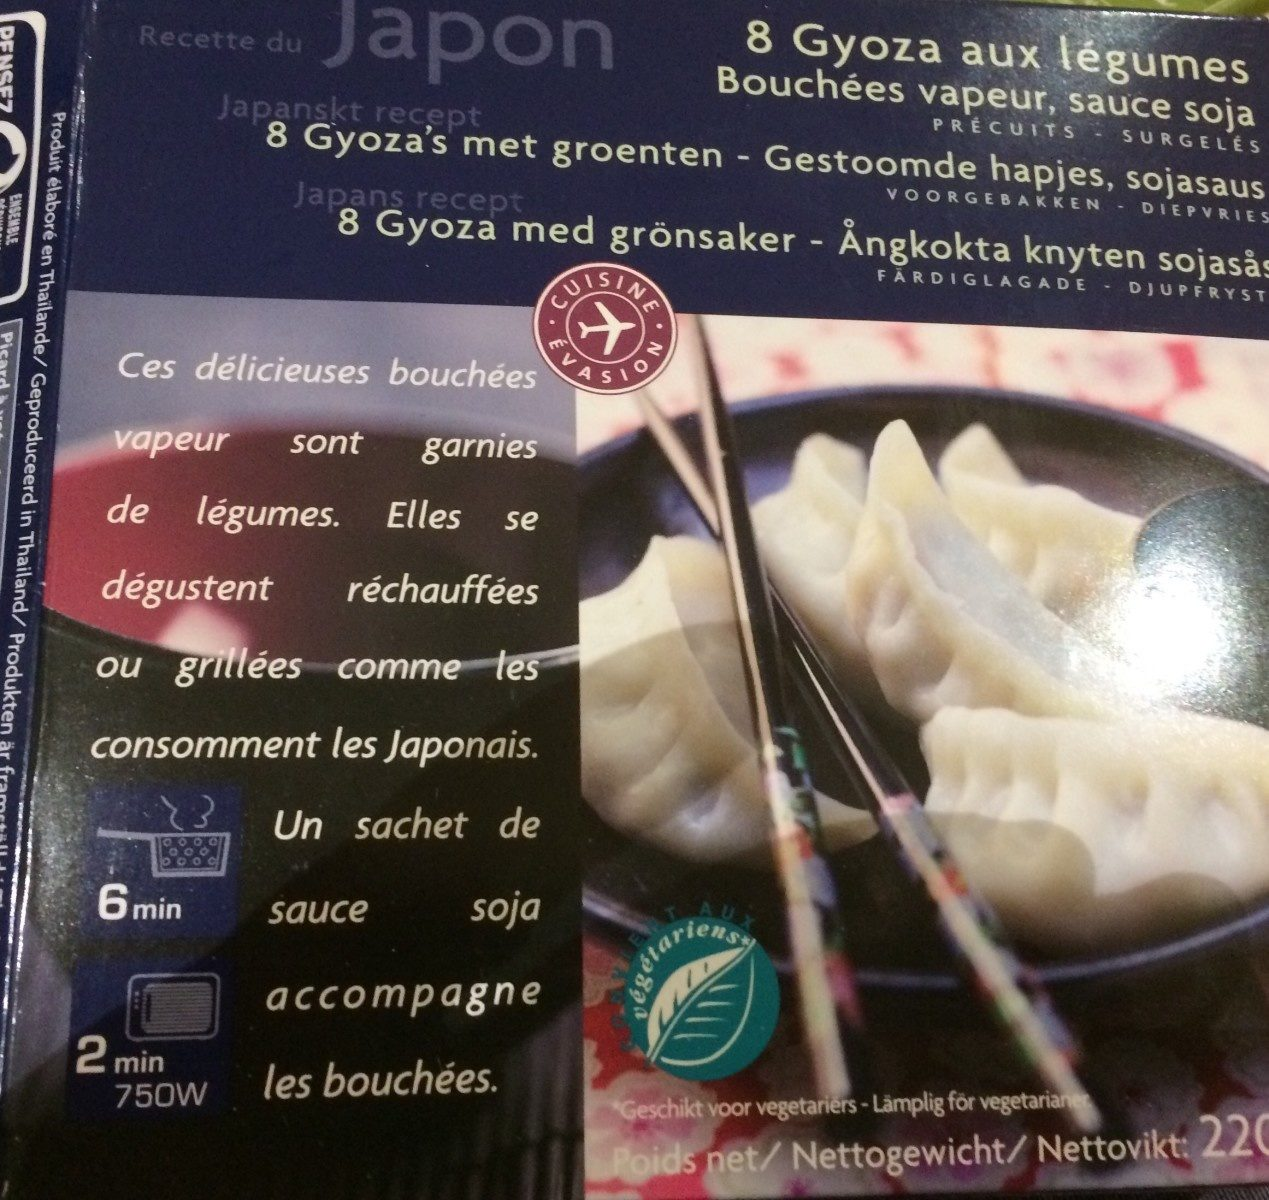 Gyoza aux legumes - Product - fr